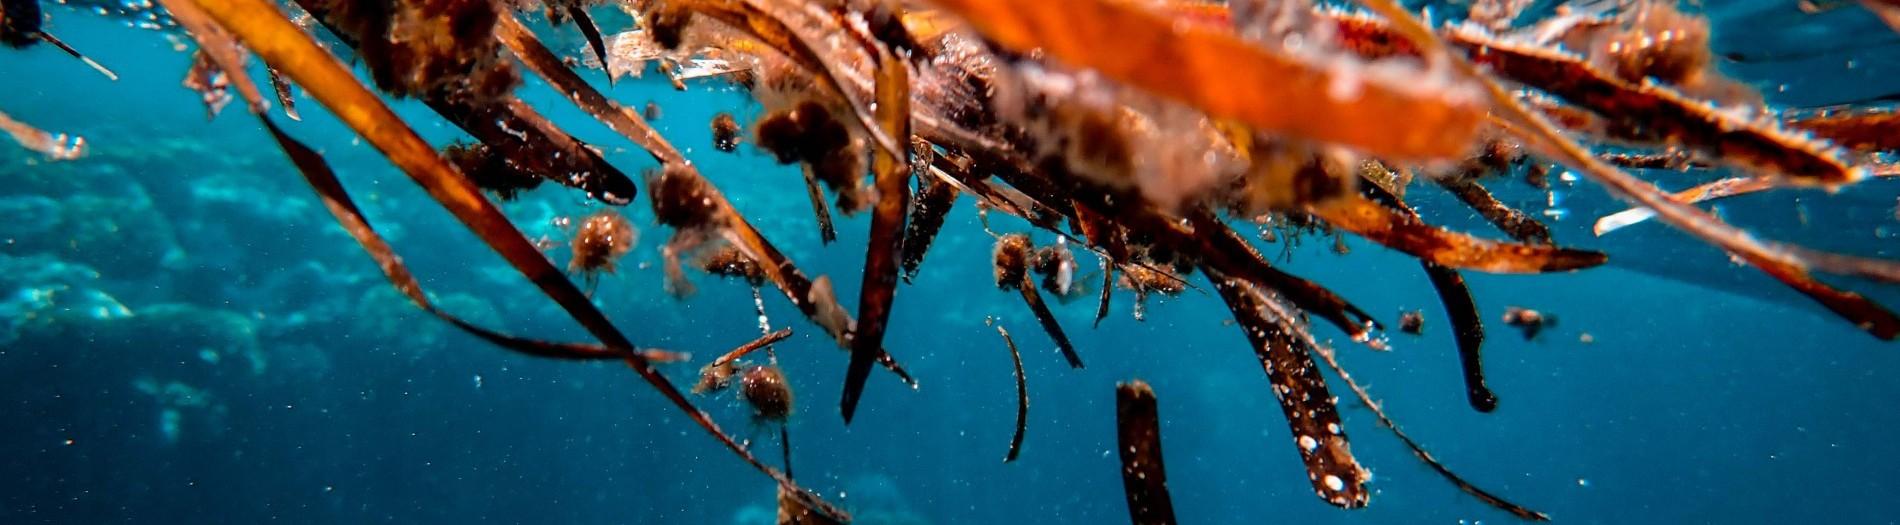 Fermented seaweed based novel feed additives - SEAFEED 2020